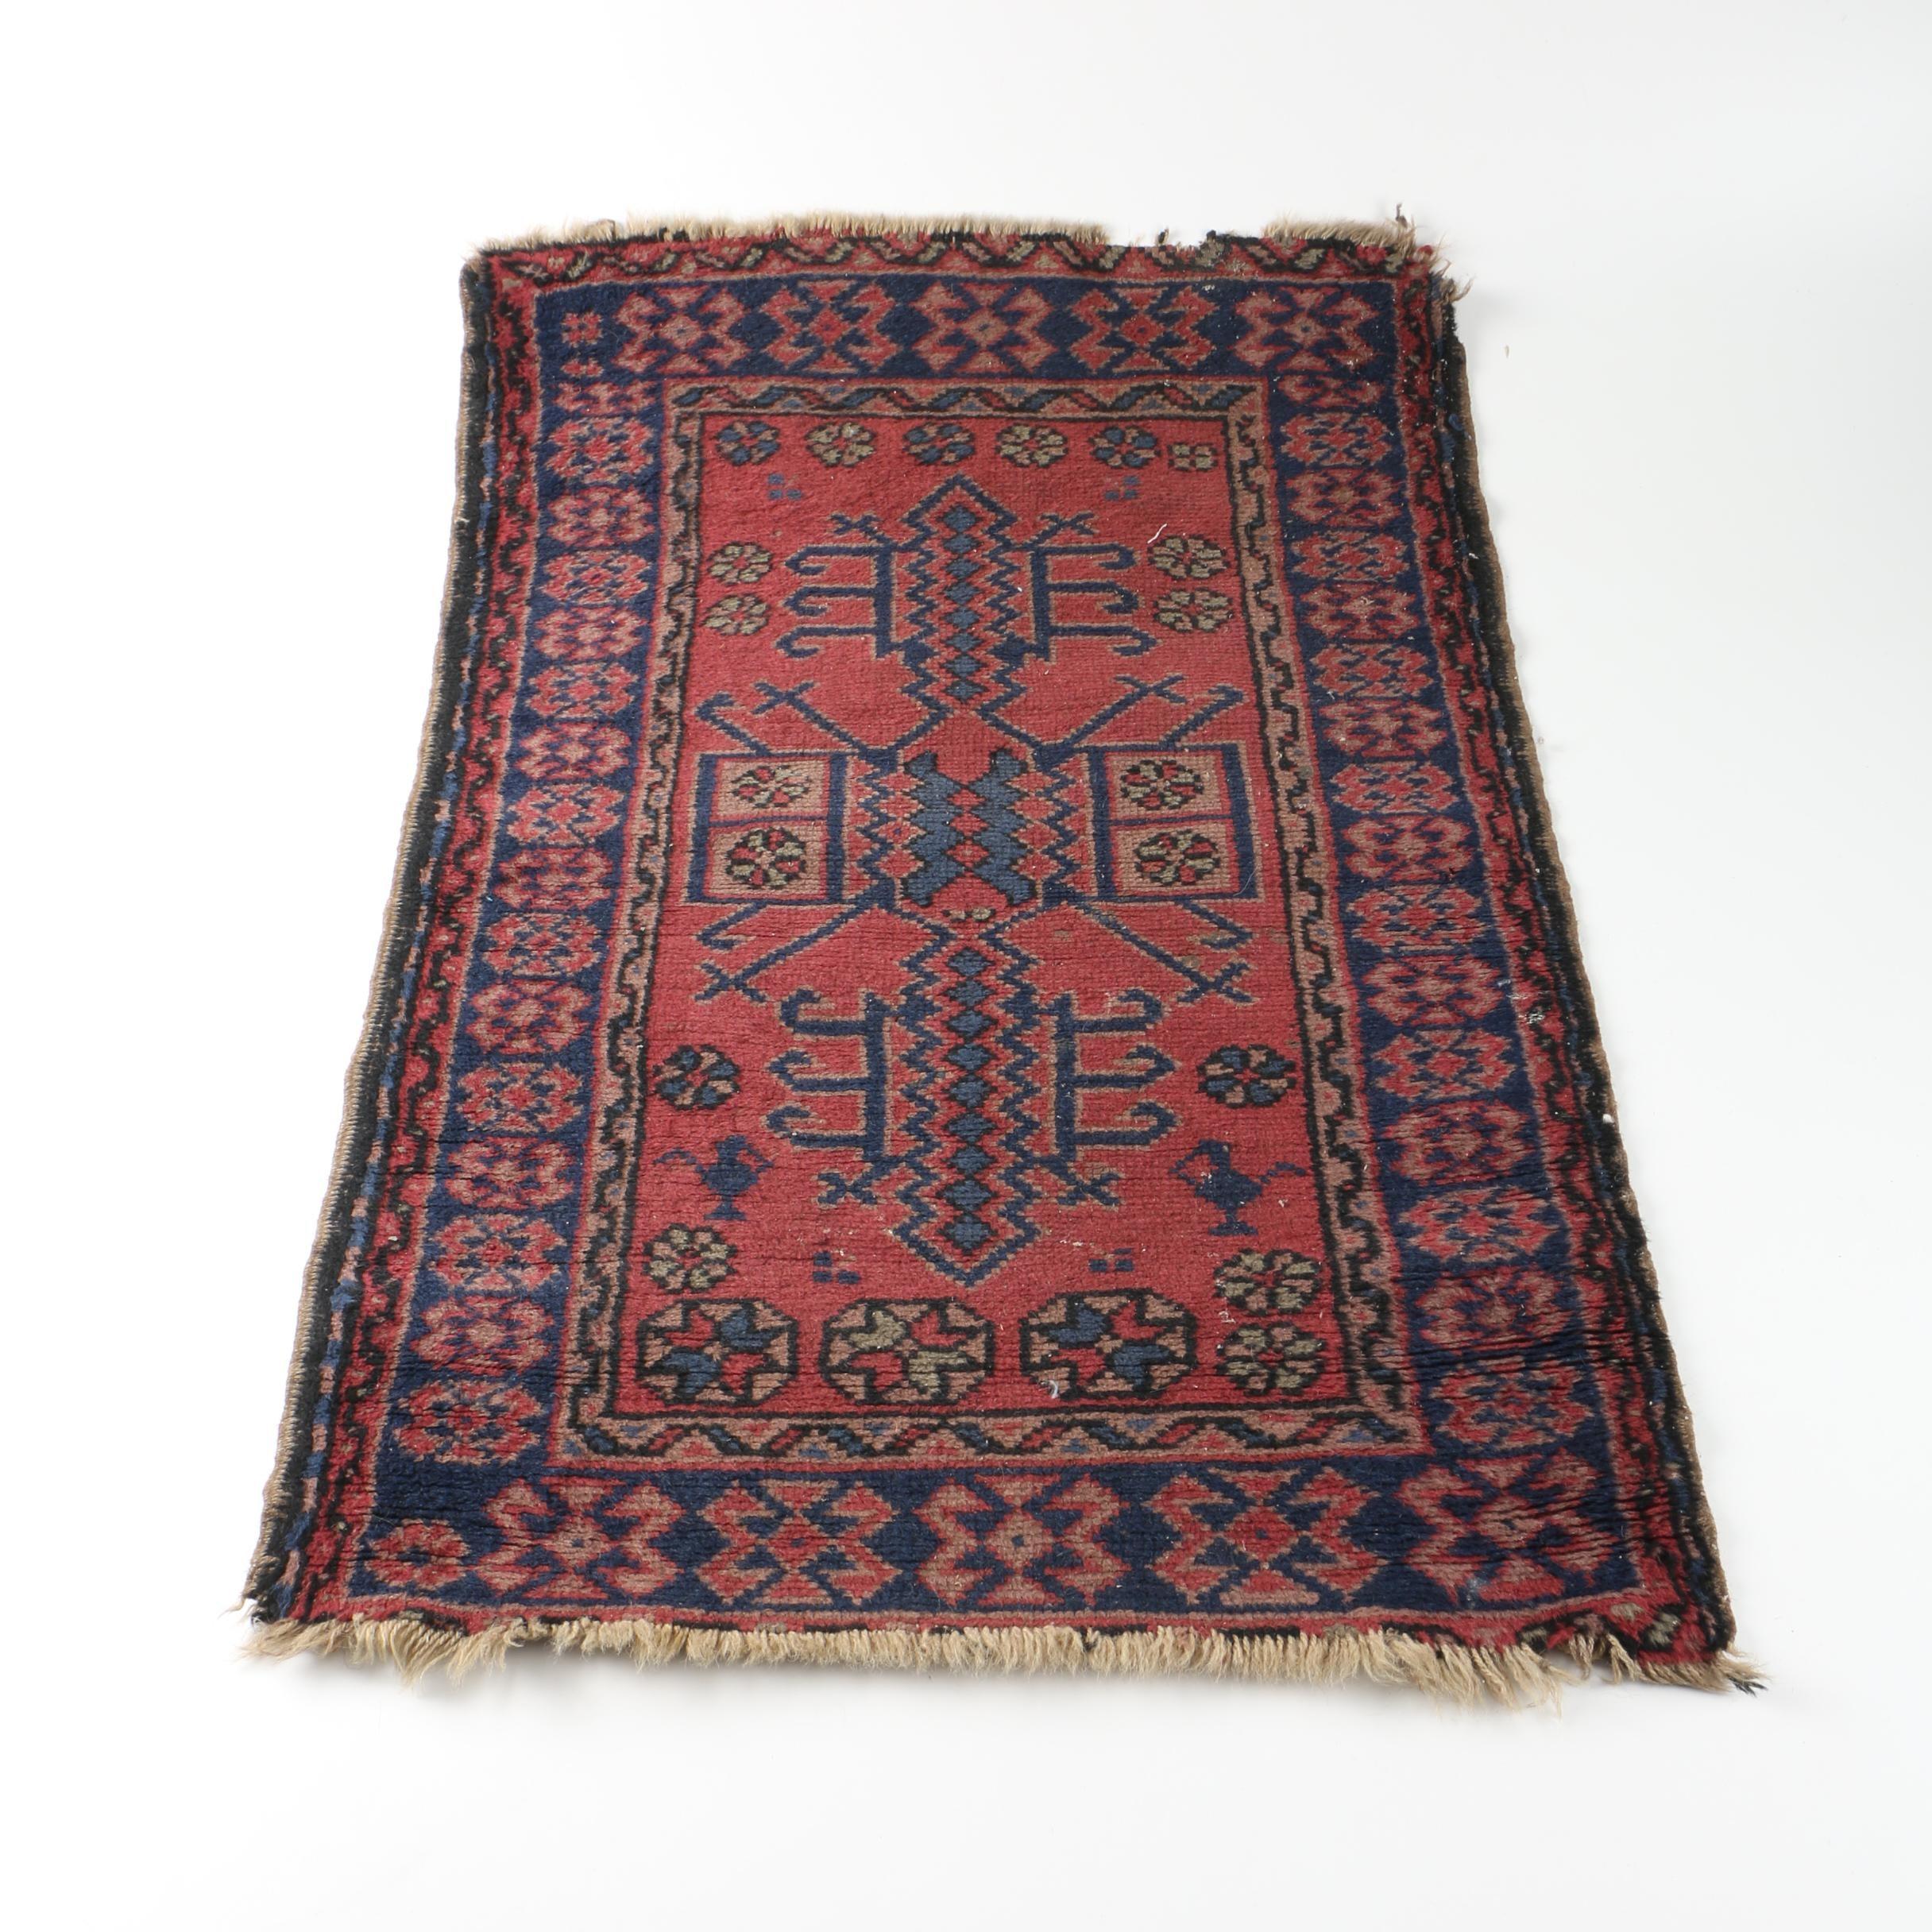 Handwoven Turkish Wool Accent Rug